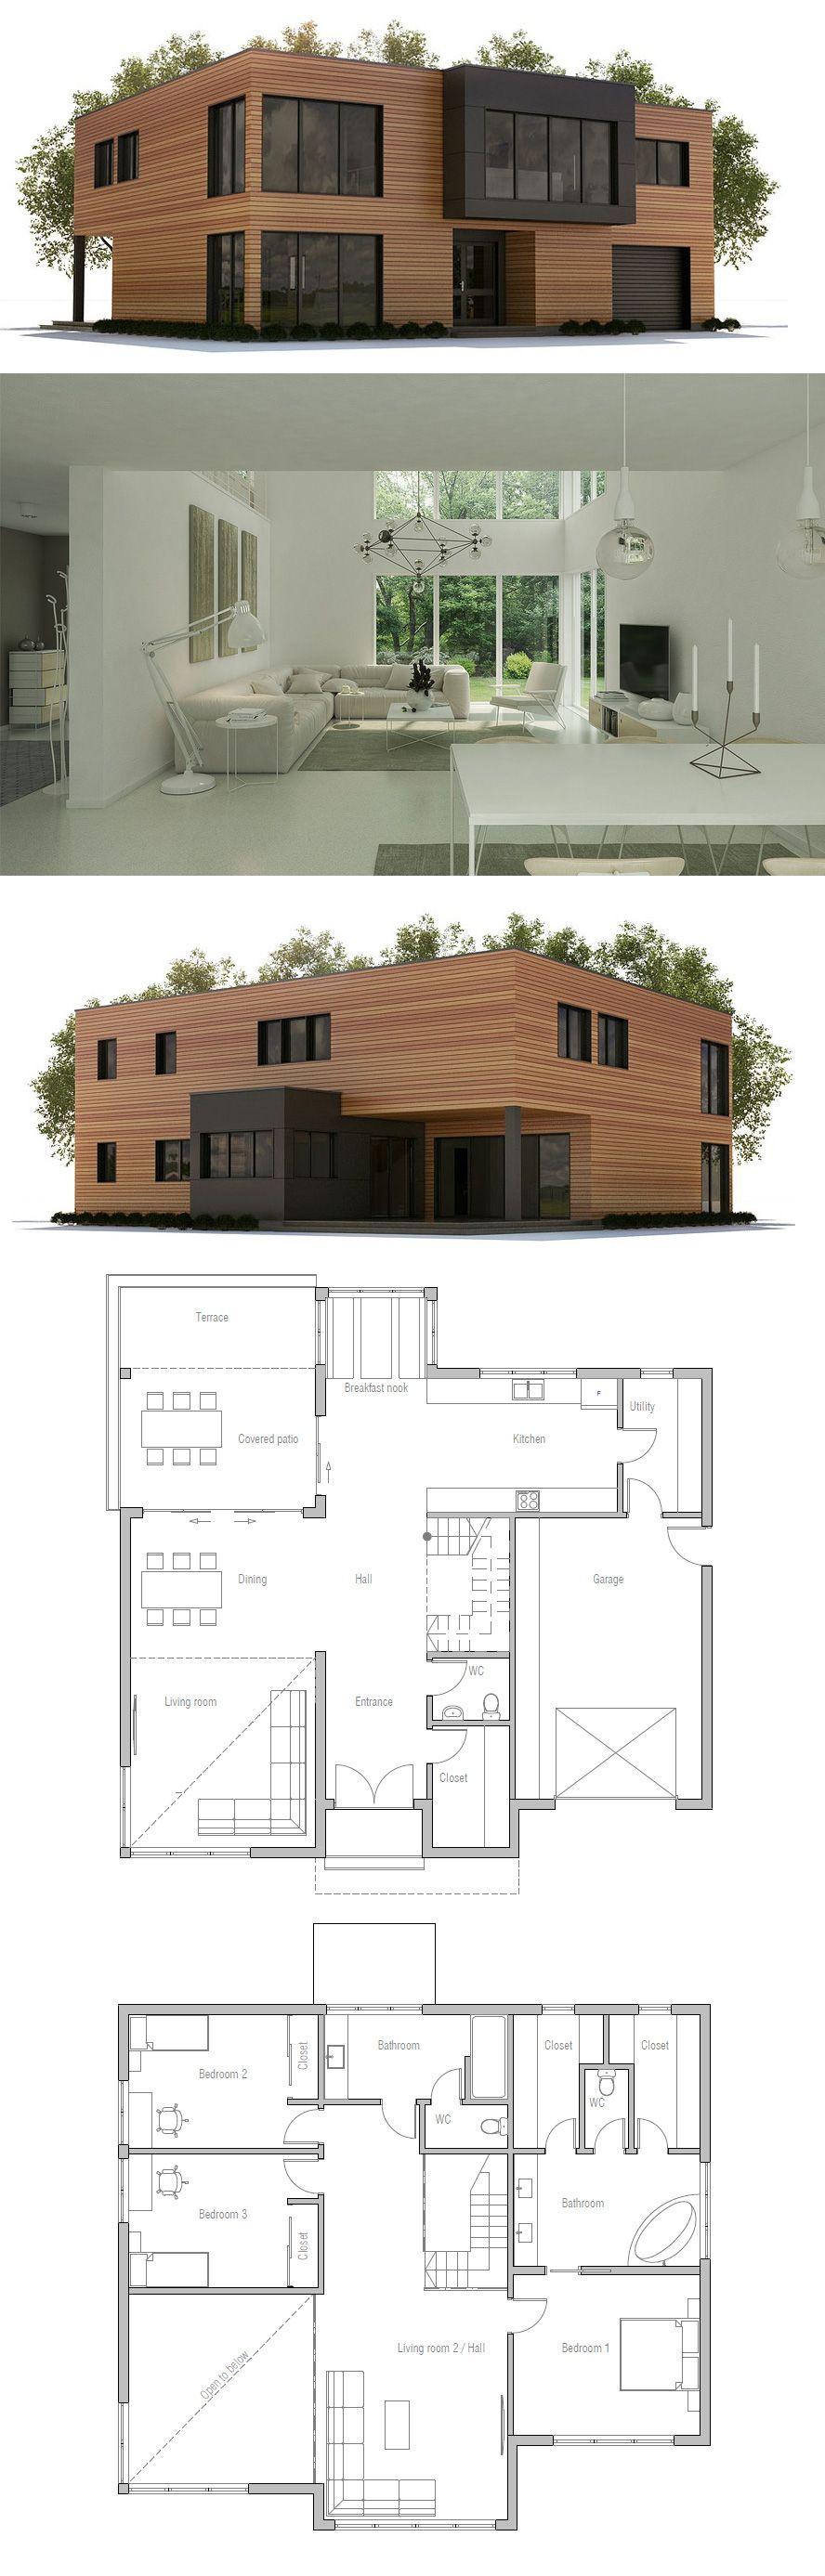 House plan arq casas casas modernas y casas contenedores for Casa minimalista 300m2